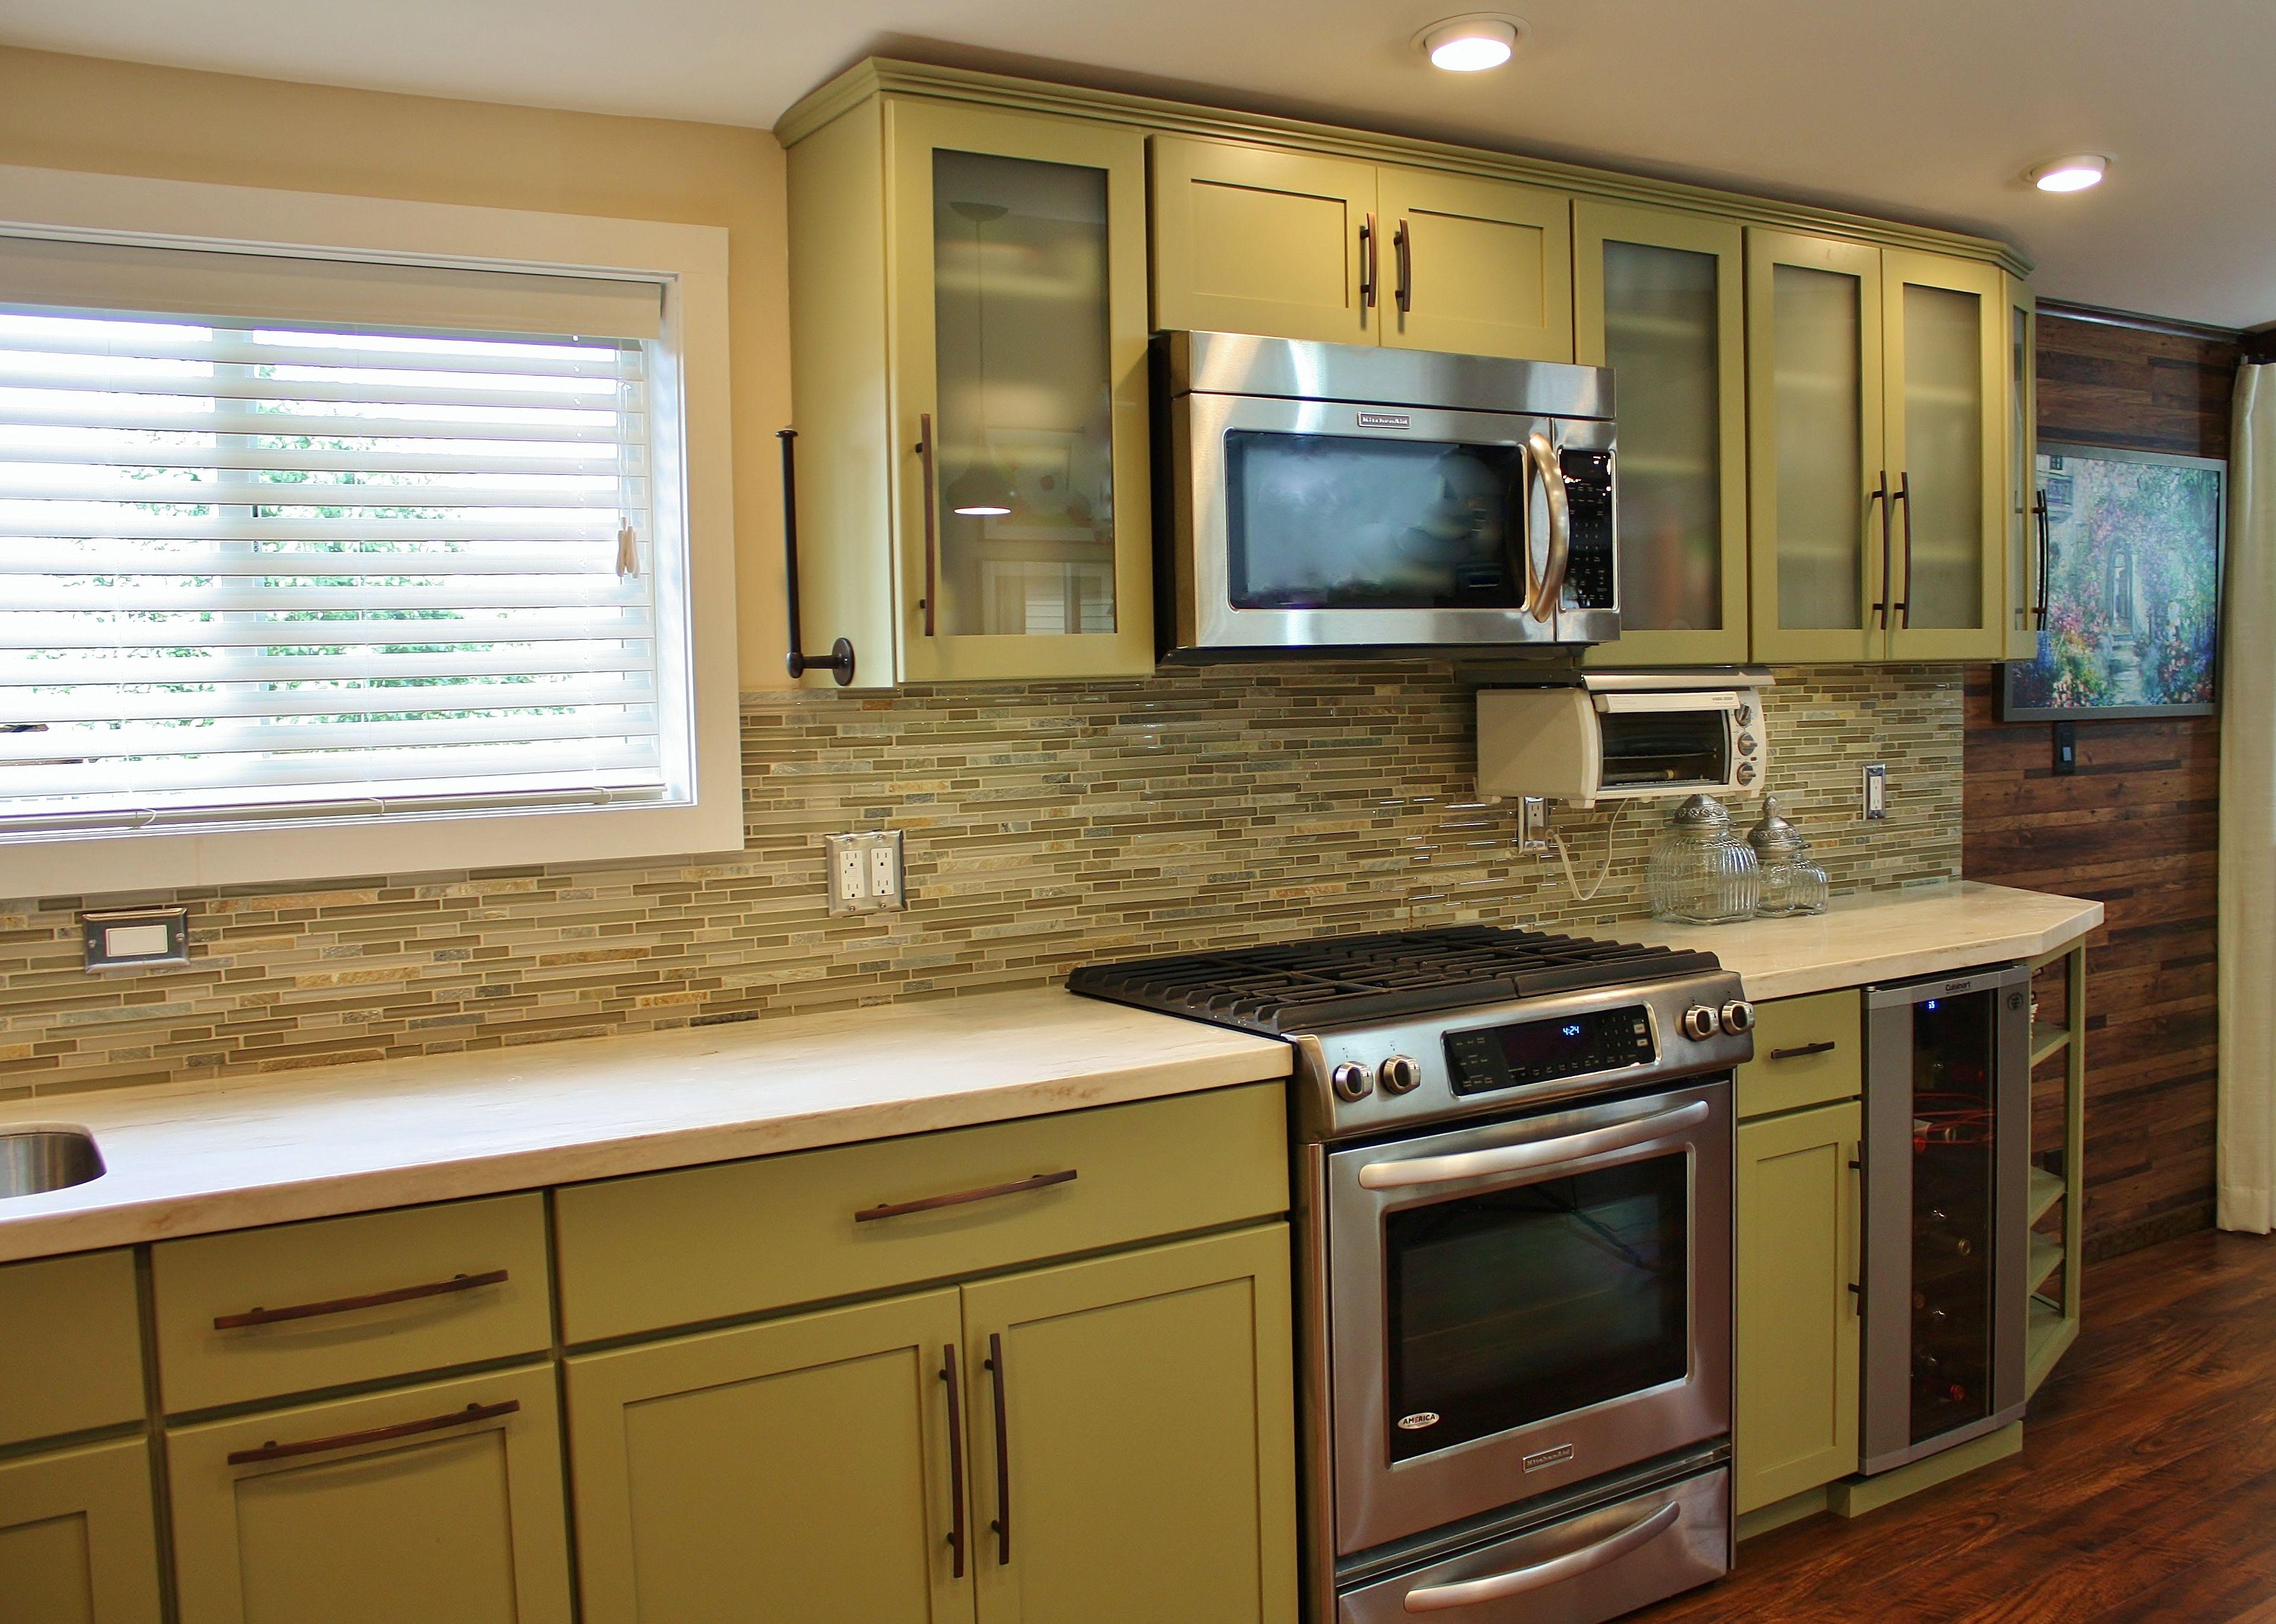 Holiday Kitchens Seattle Shaker Cabinets Corian Solid Surface Countertops Kosher Kitchen Glass Doors Wine Fr Backsplash Farmhouse Backsplash Diy Backsplash